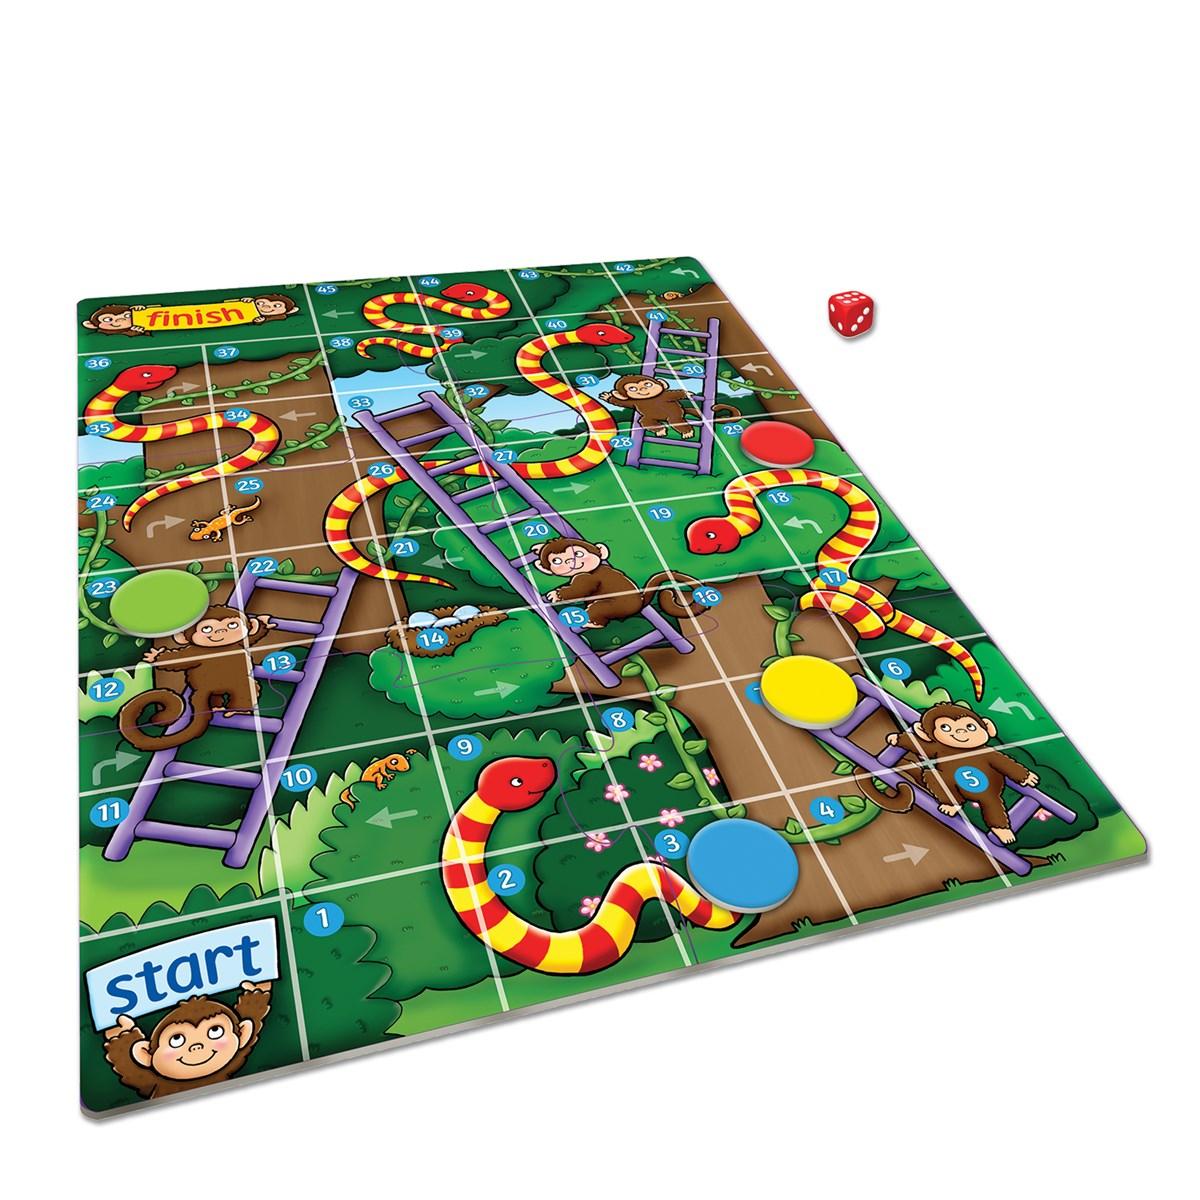 Jungle Snakes Ladders Mini Game